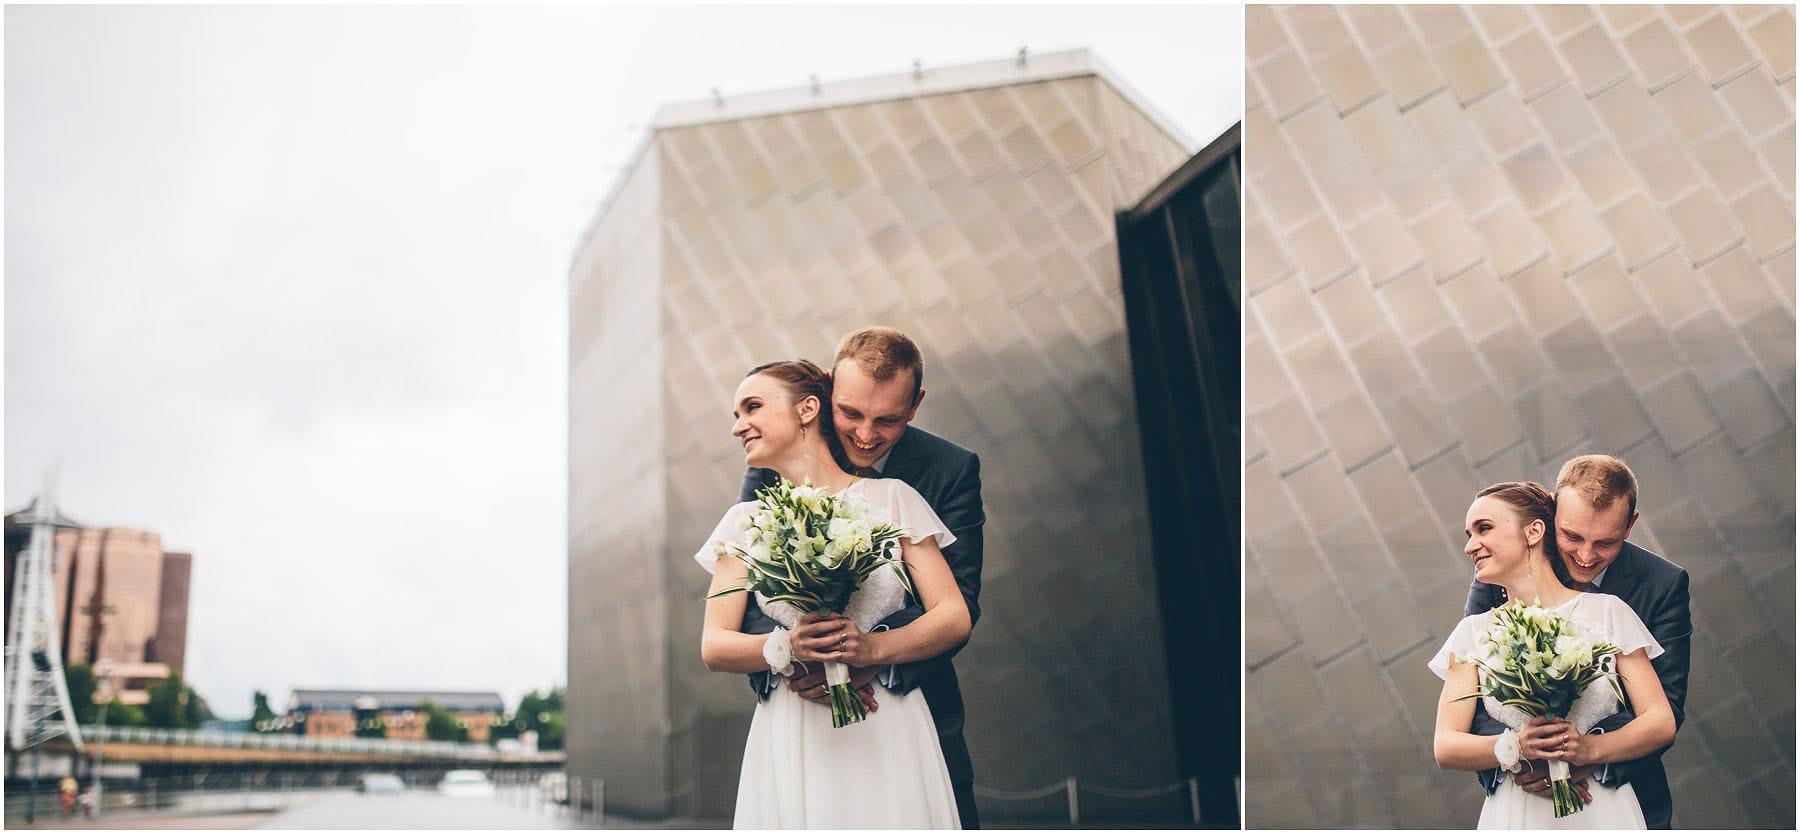 Lowry_Theatre_Wedding_Photography_0069